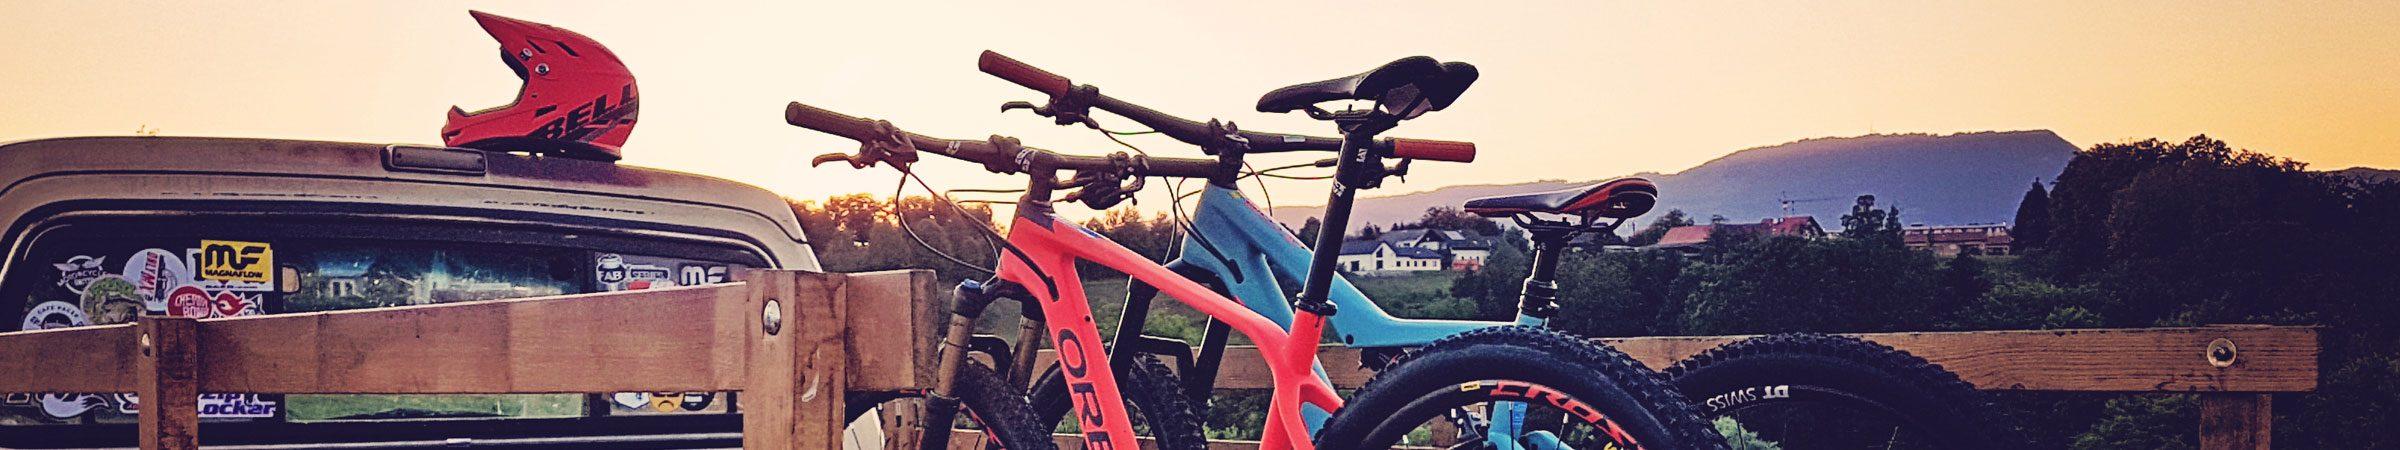 car-bike-header-2